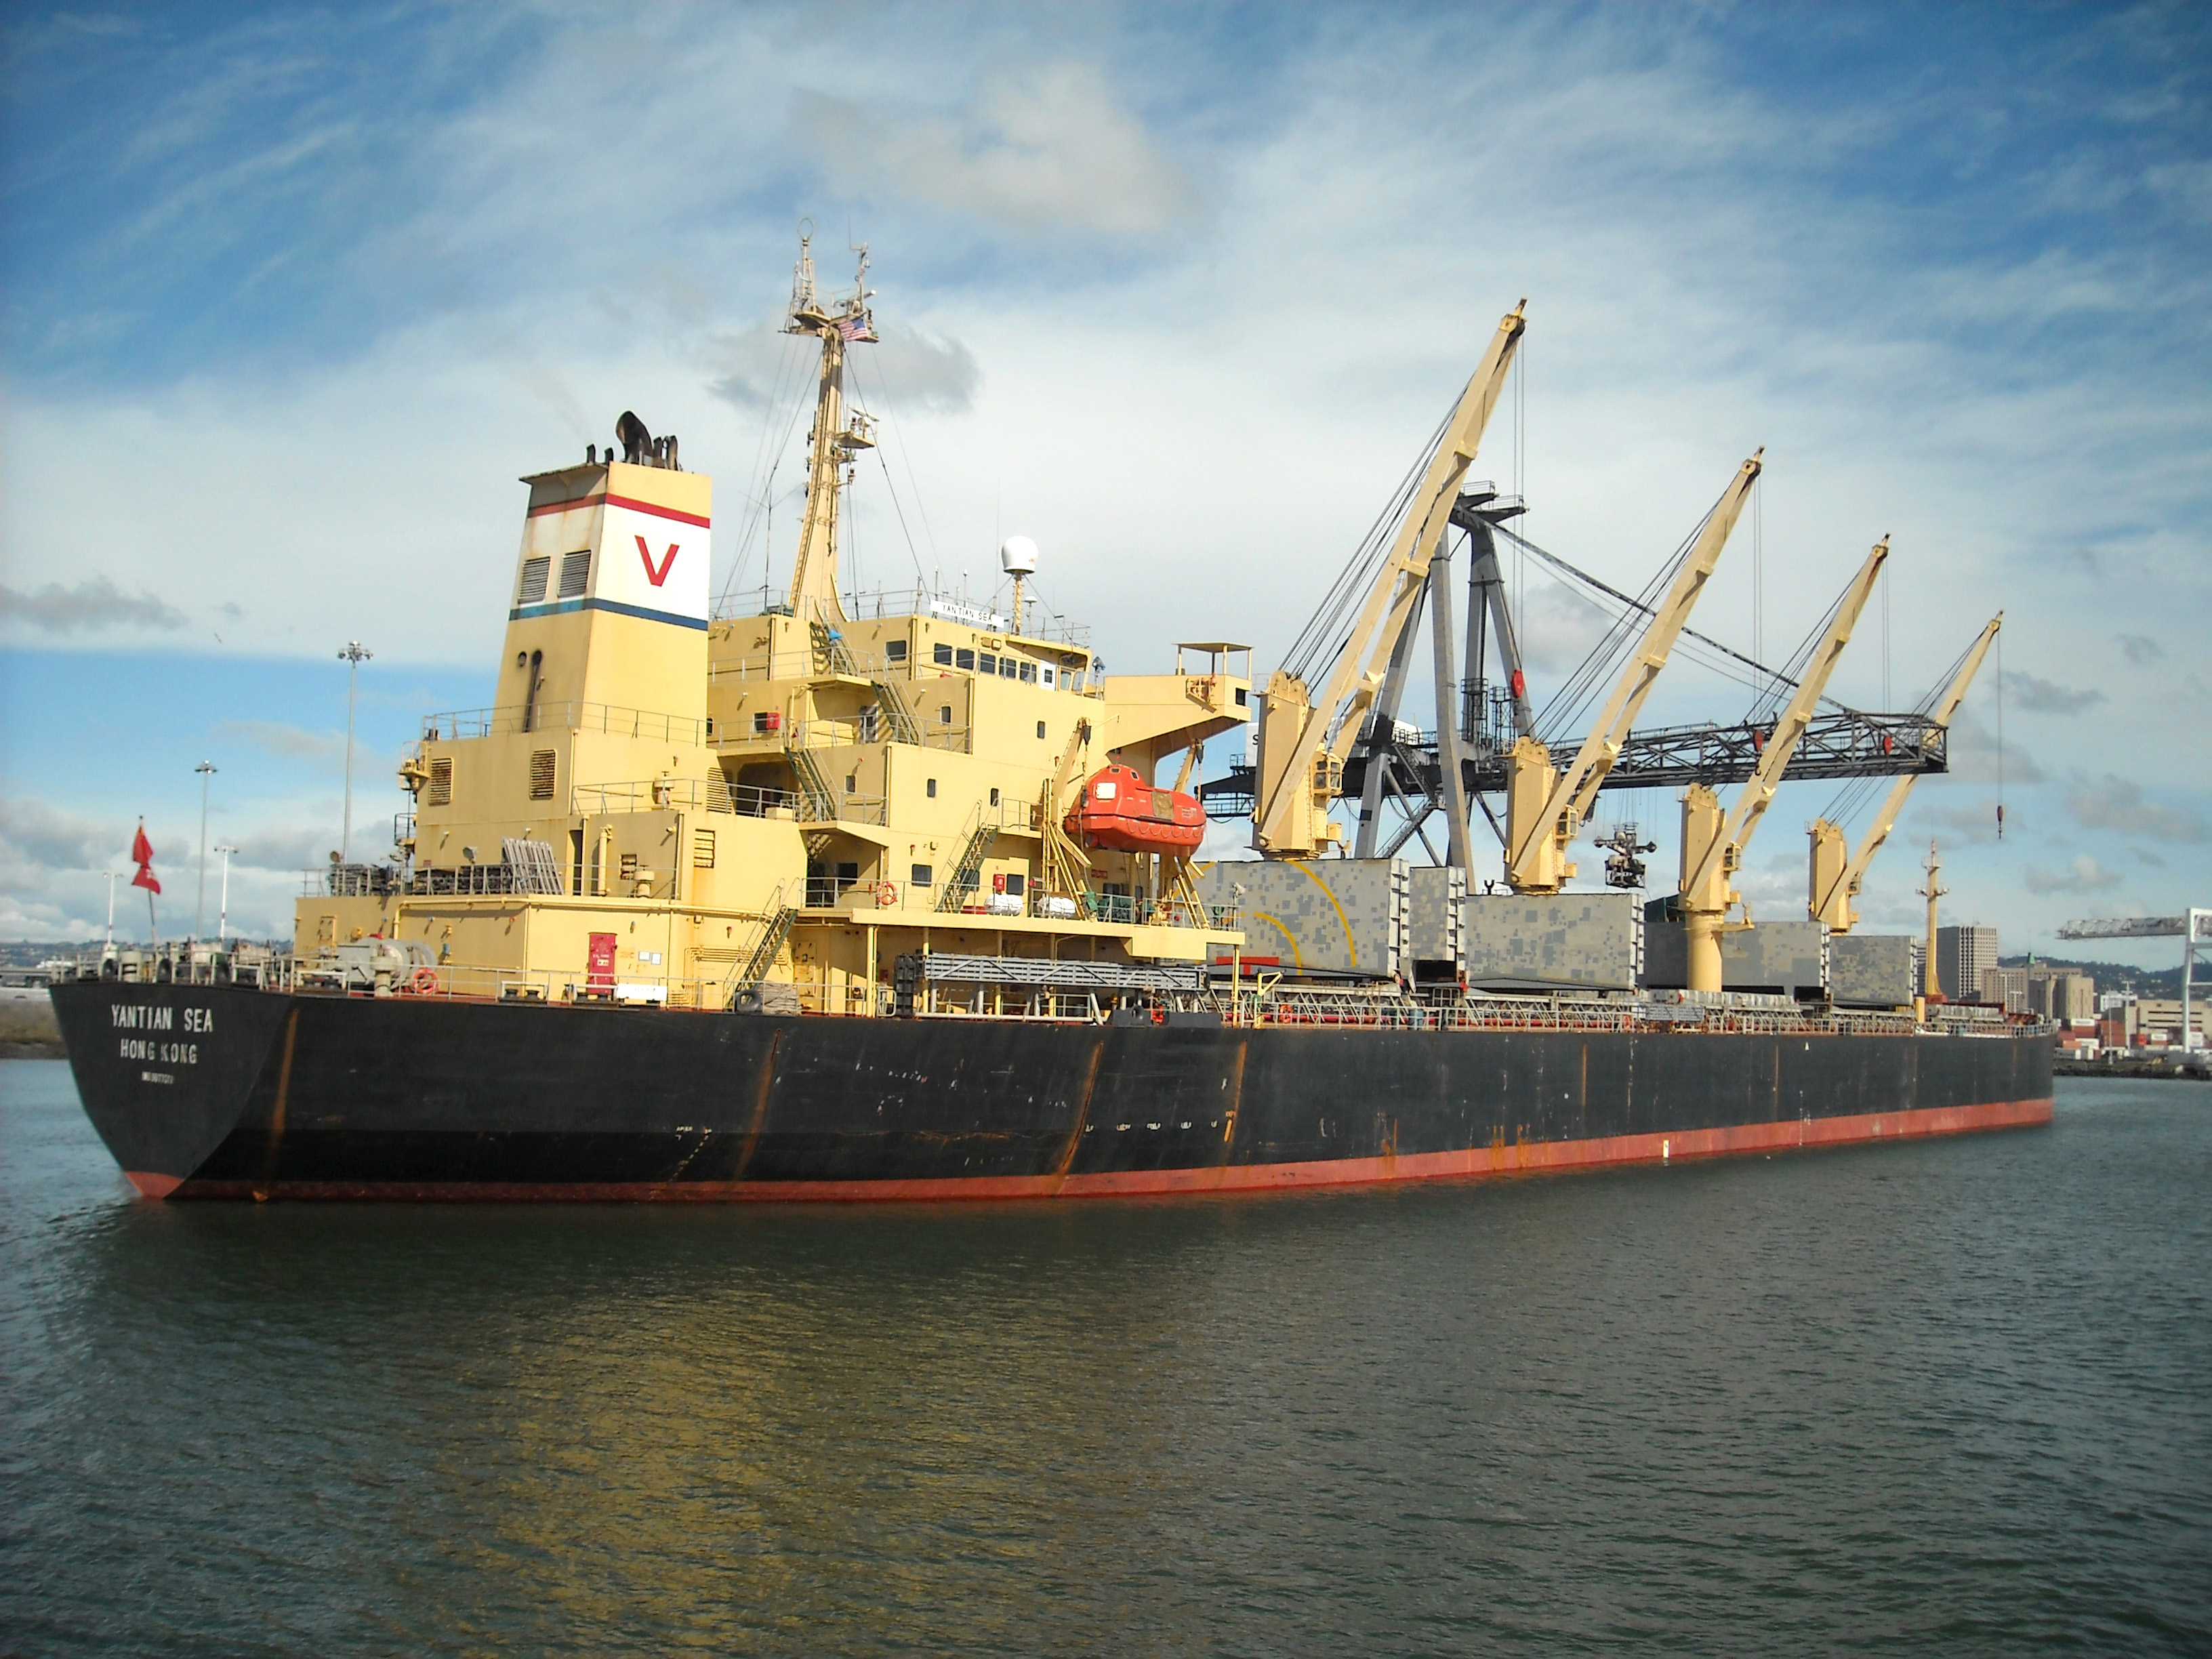 File:Cargo Ship Yantian Sea.jpg - Wikimedia Commons